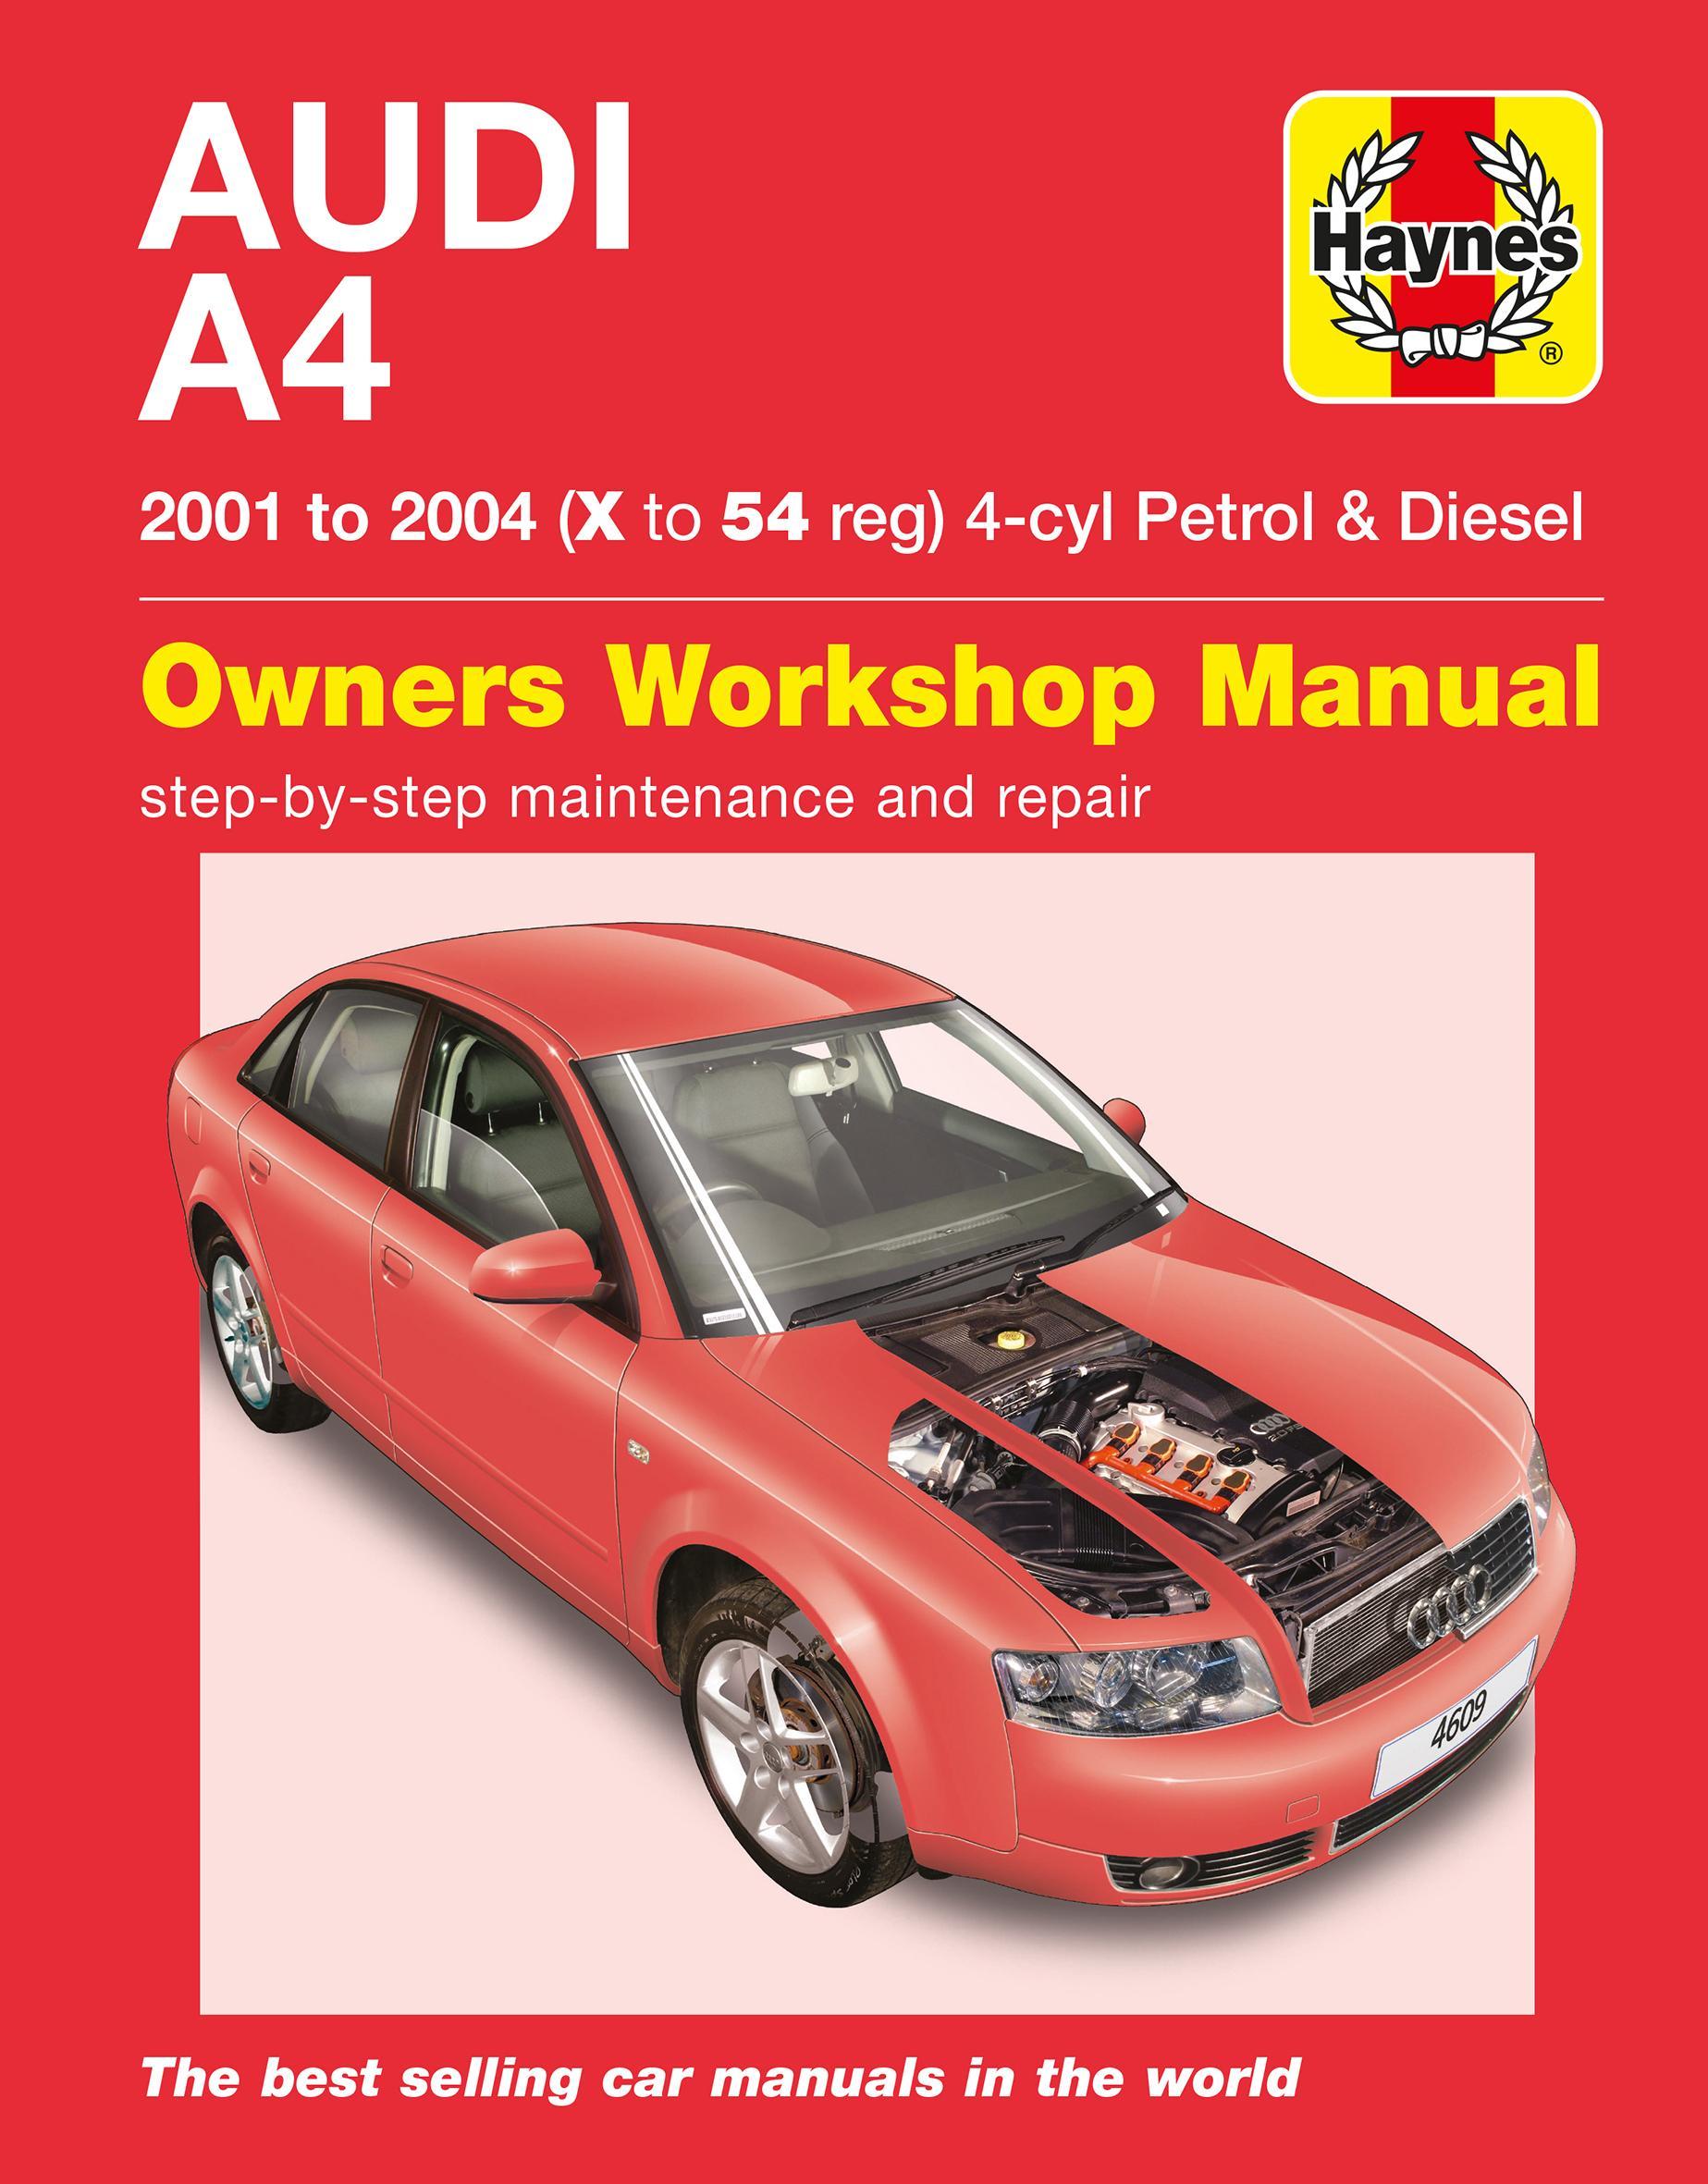 haynes audi a4 01 to 04 manual rh halfords com Audi Cars Audi Cars